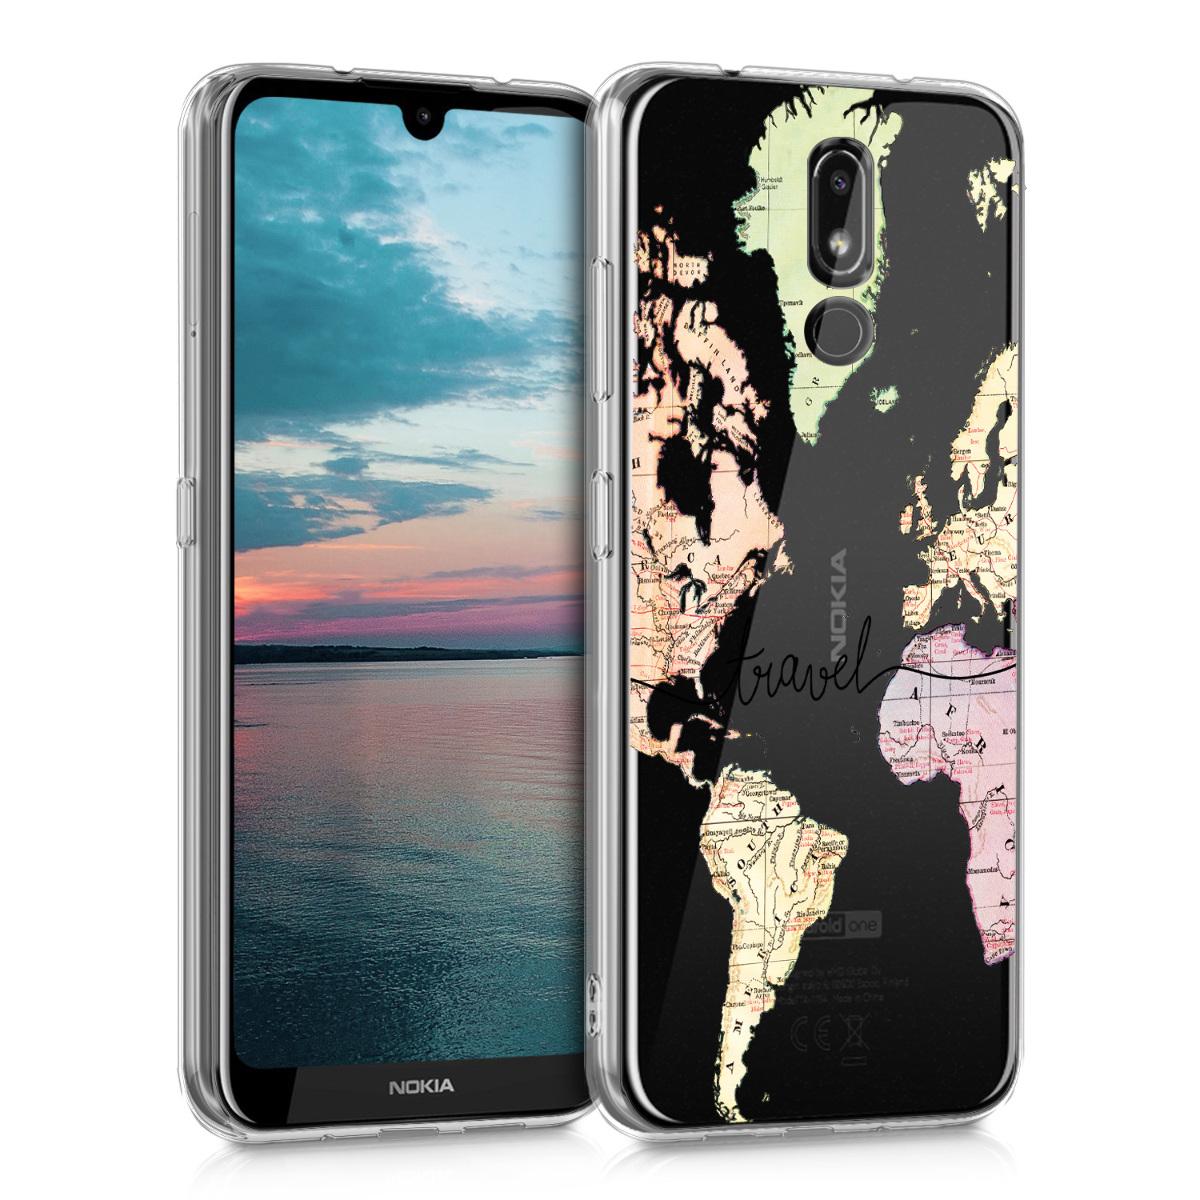 KW Θήκη Σιλικόνης Nokia 3.2 - Crystal Clear - Black / Multicolor / Transparent (48015.05)